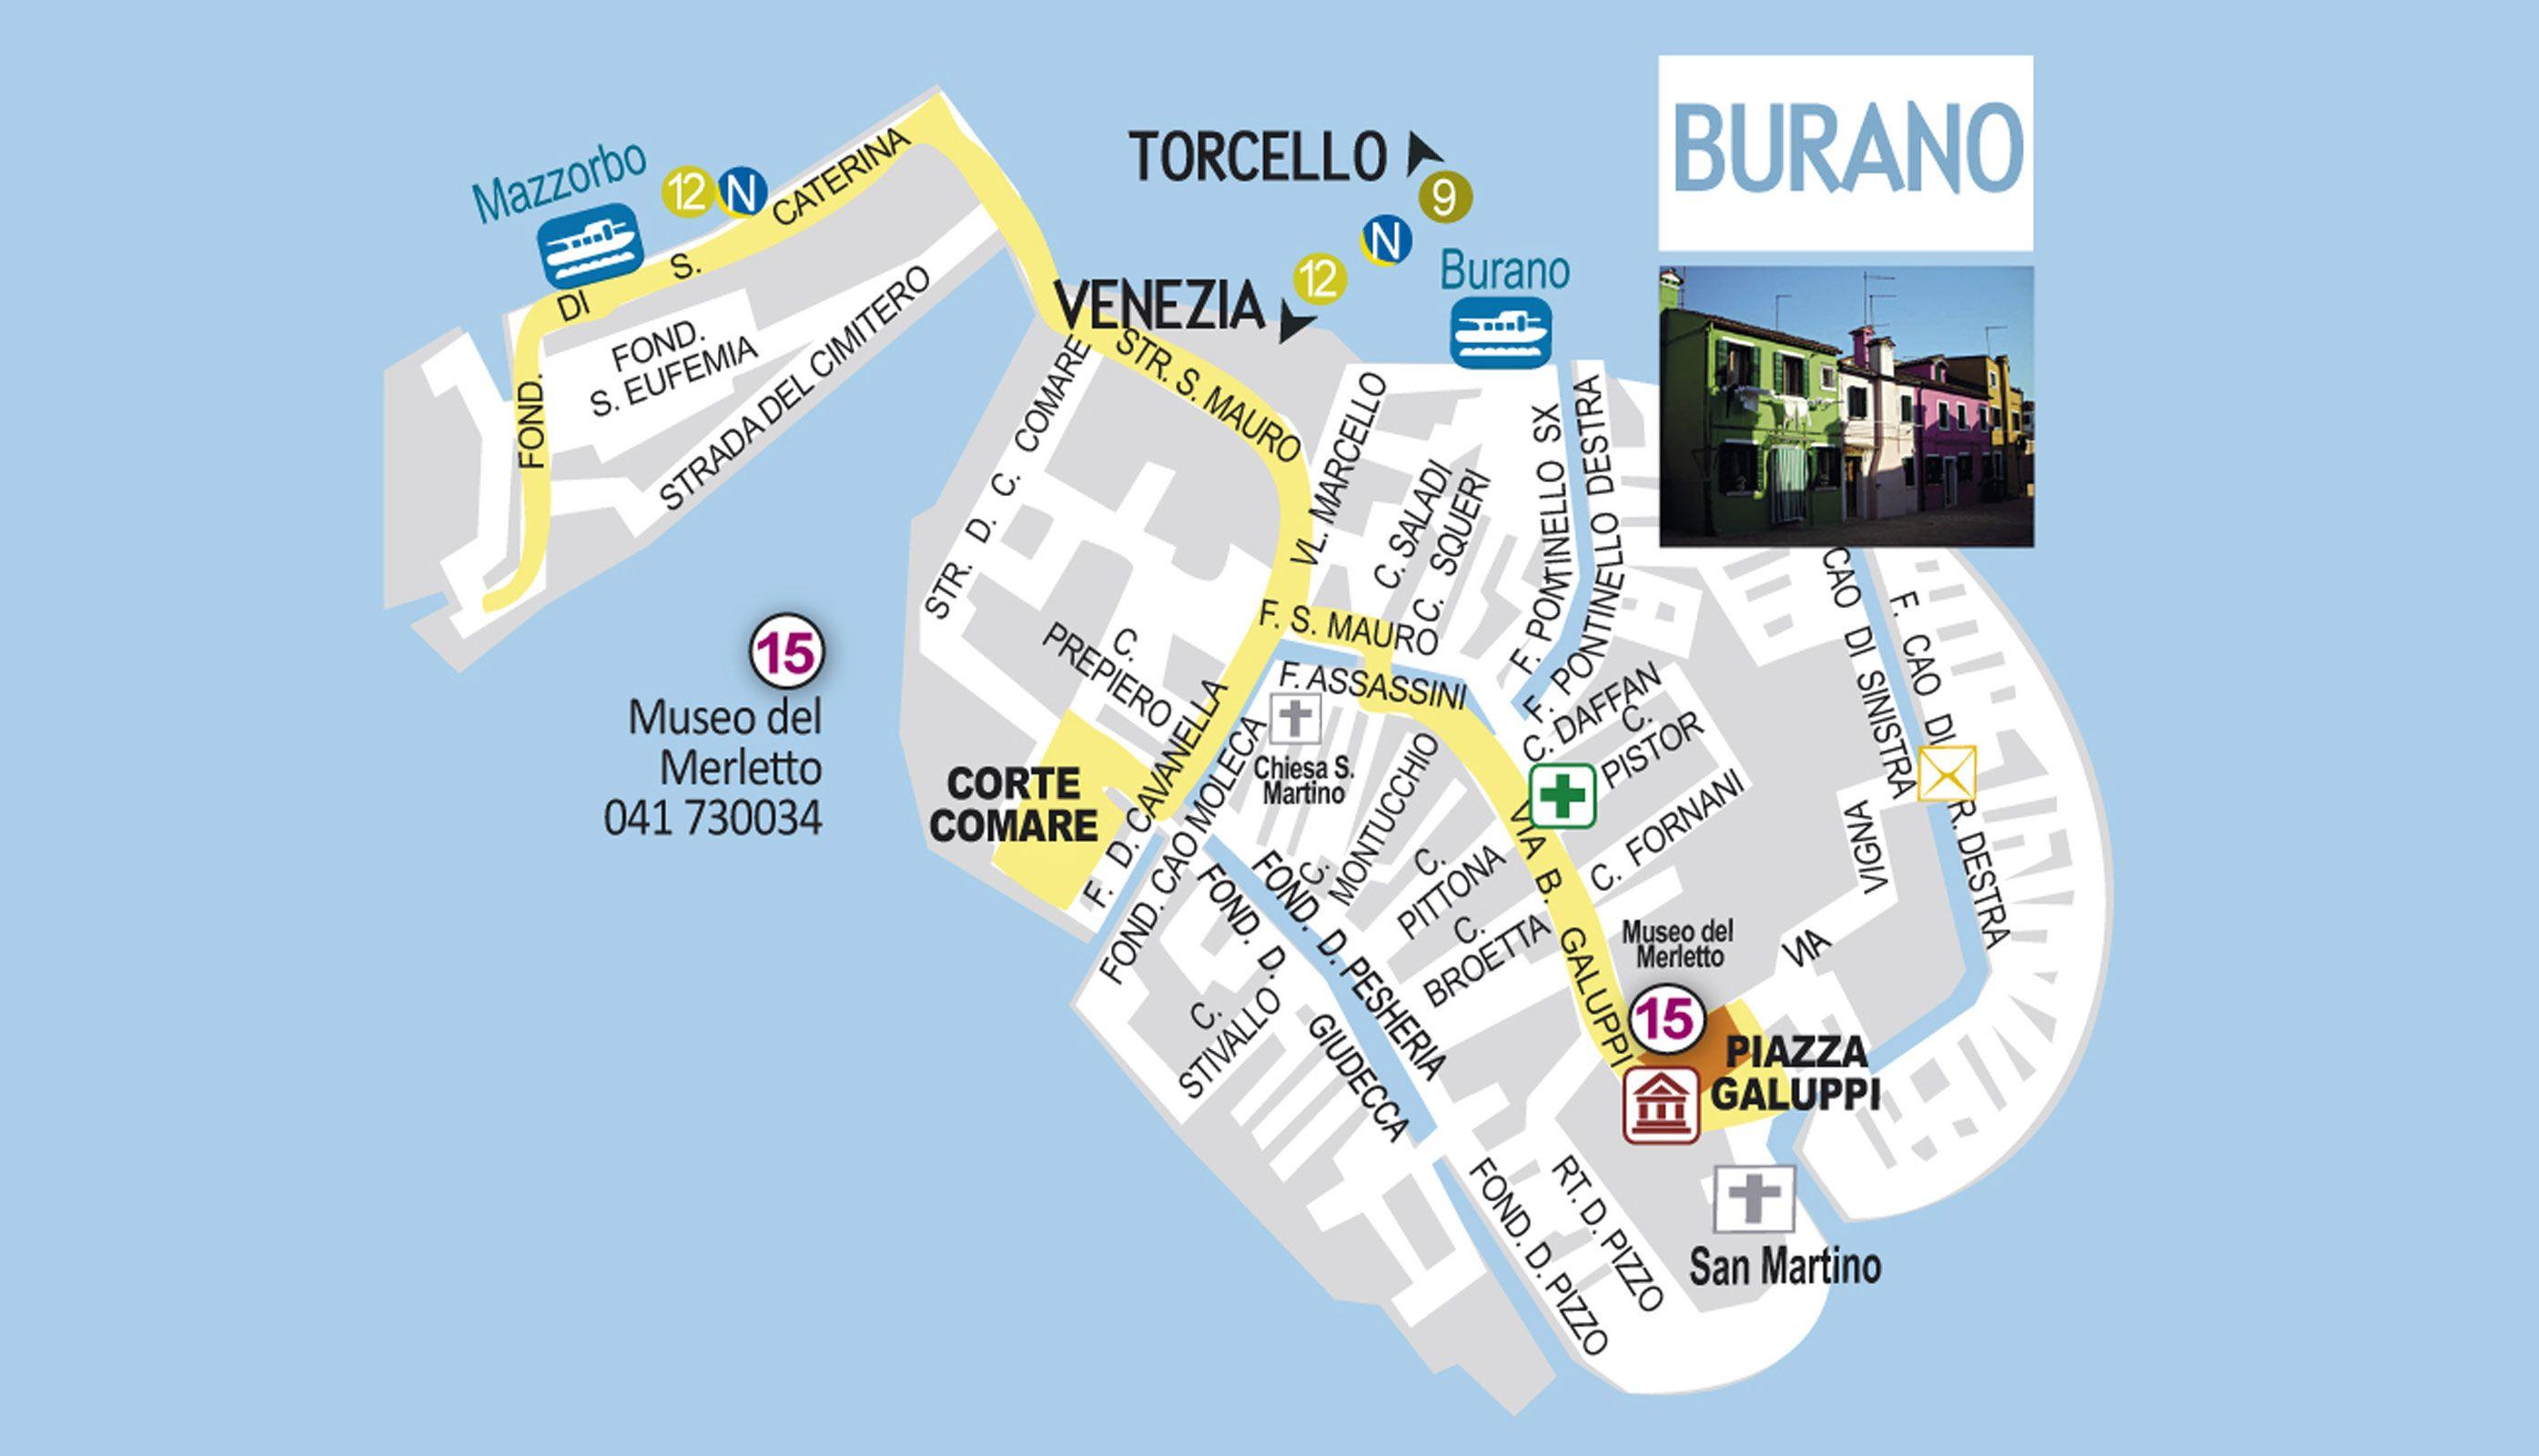 Island of Burano  Buranos Lace  Italyinformationeu  The